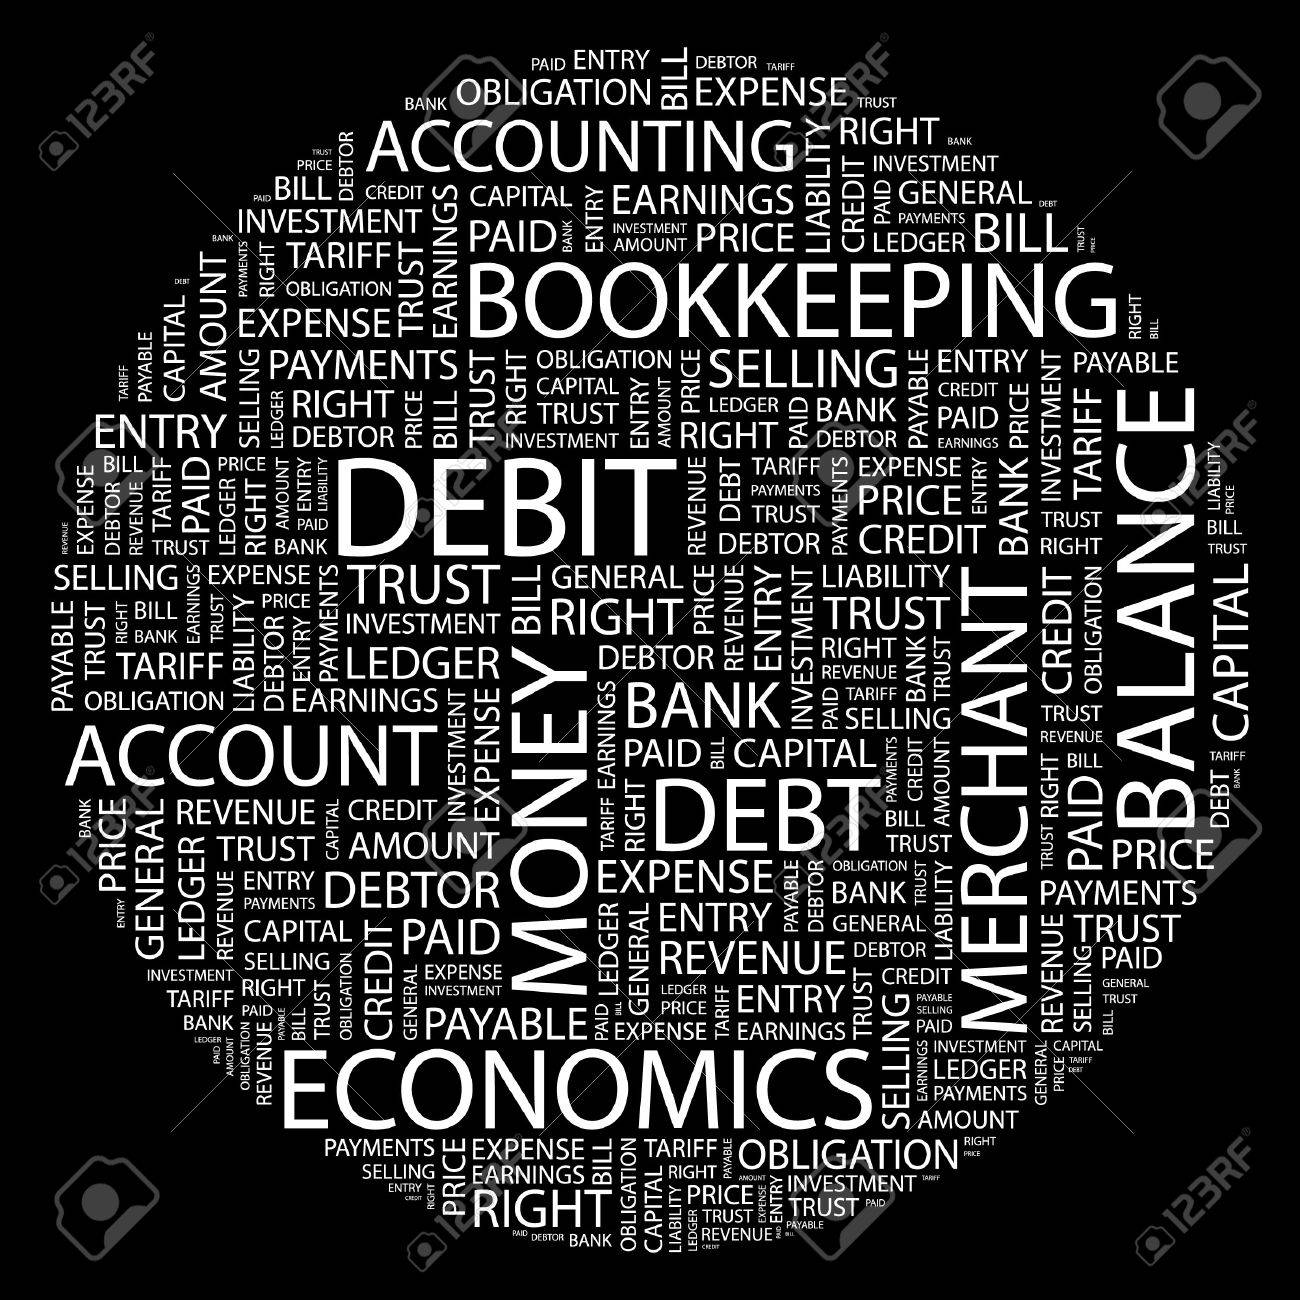 DEBIT. Word collage on black background. Stock Vector - 7031894